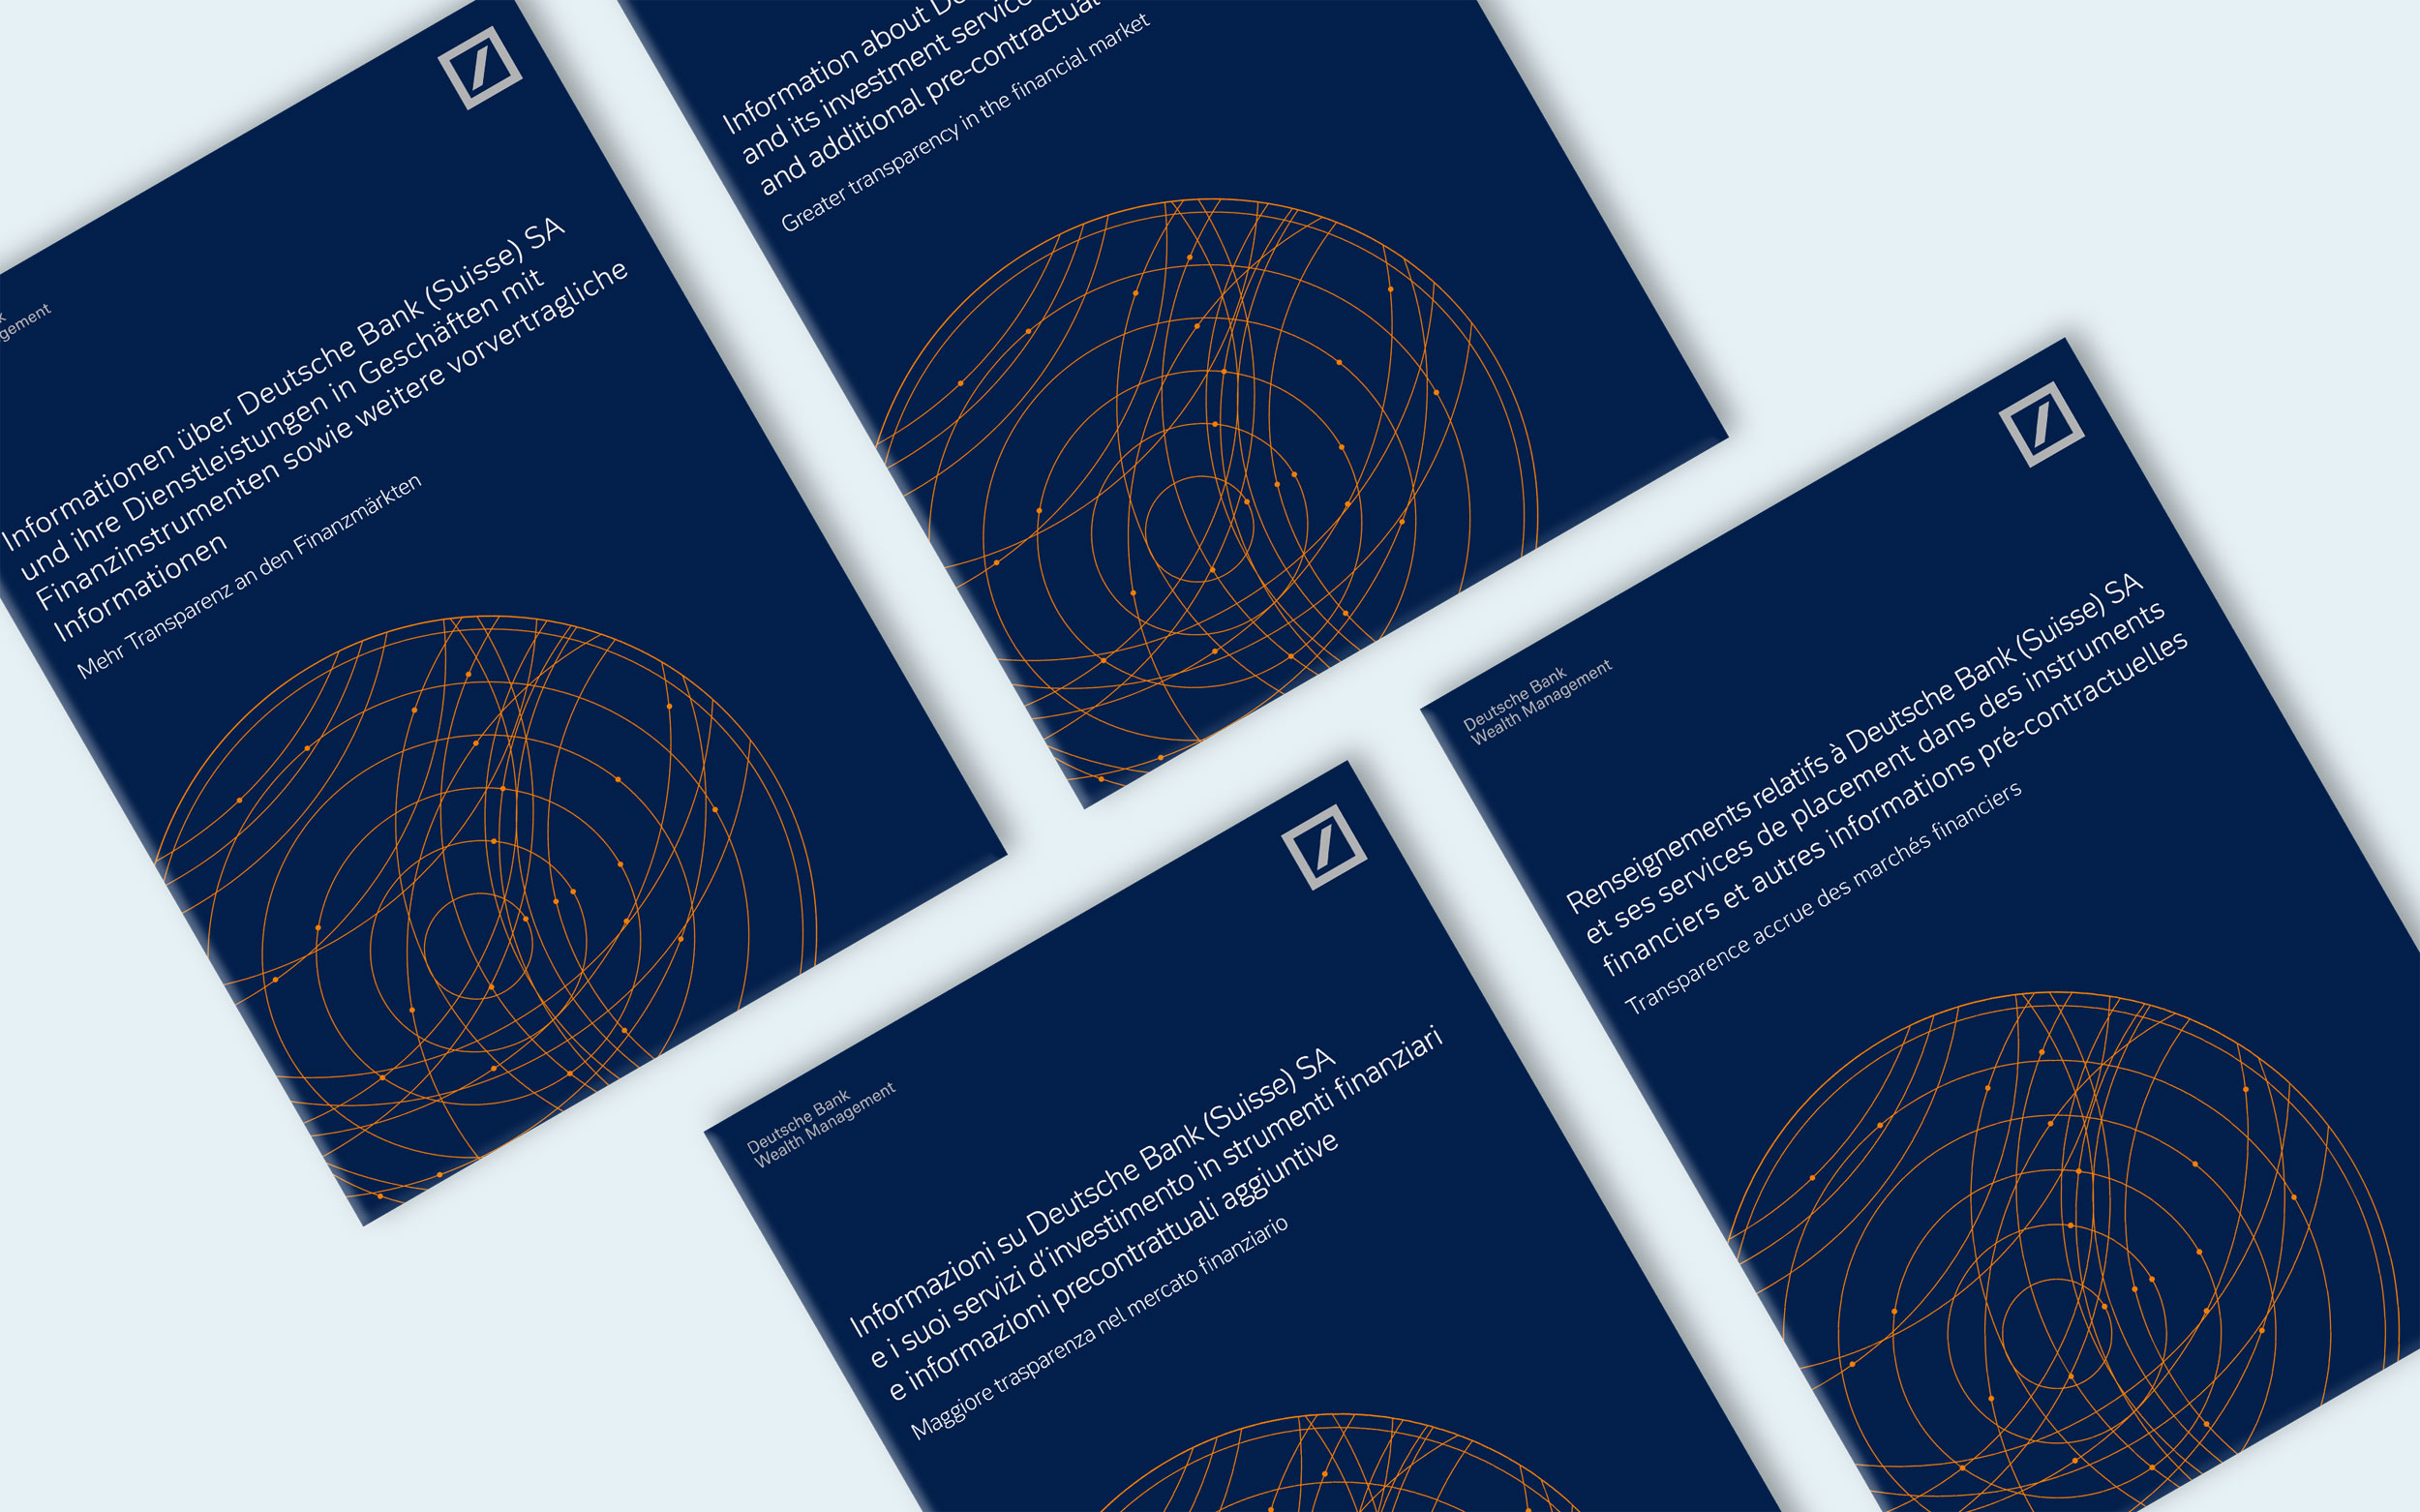 Simulation-Cover-DBI-MiFID-II-Starterpaket-Master-1